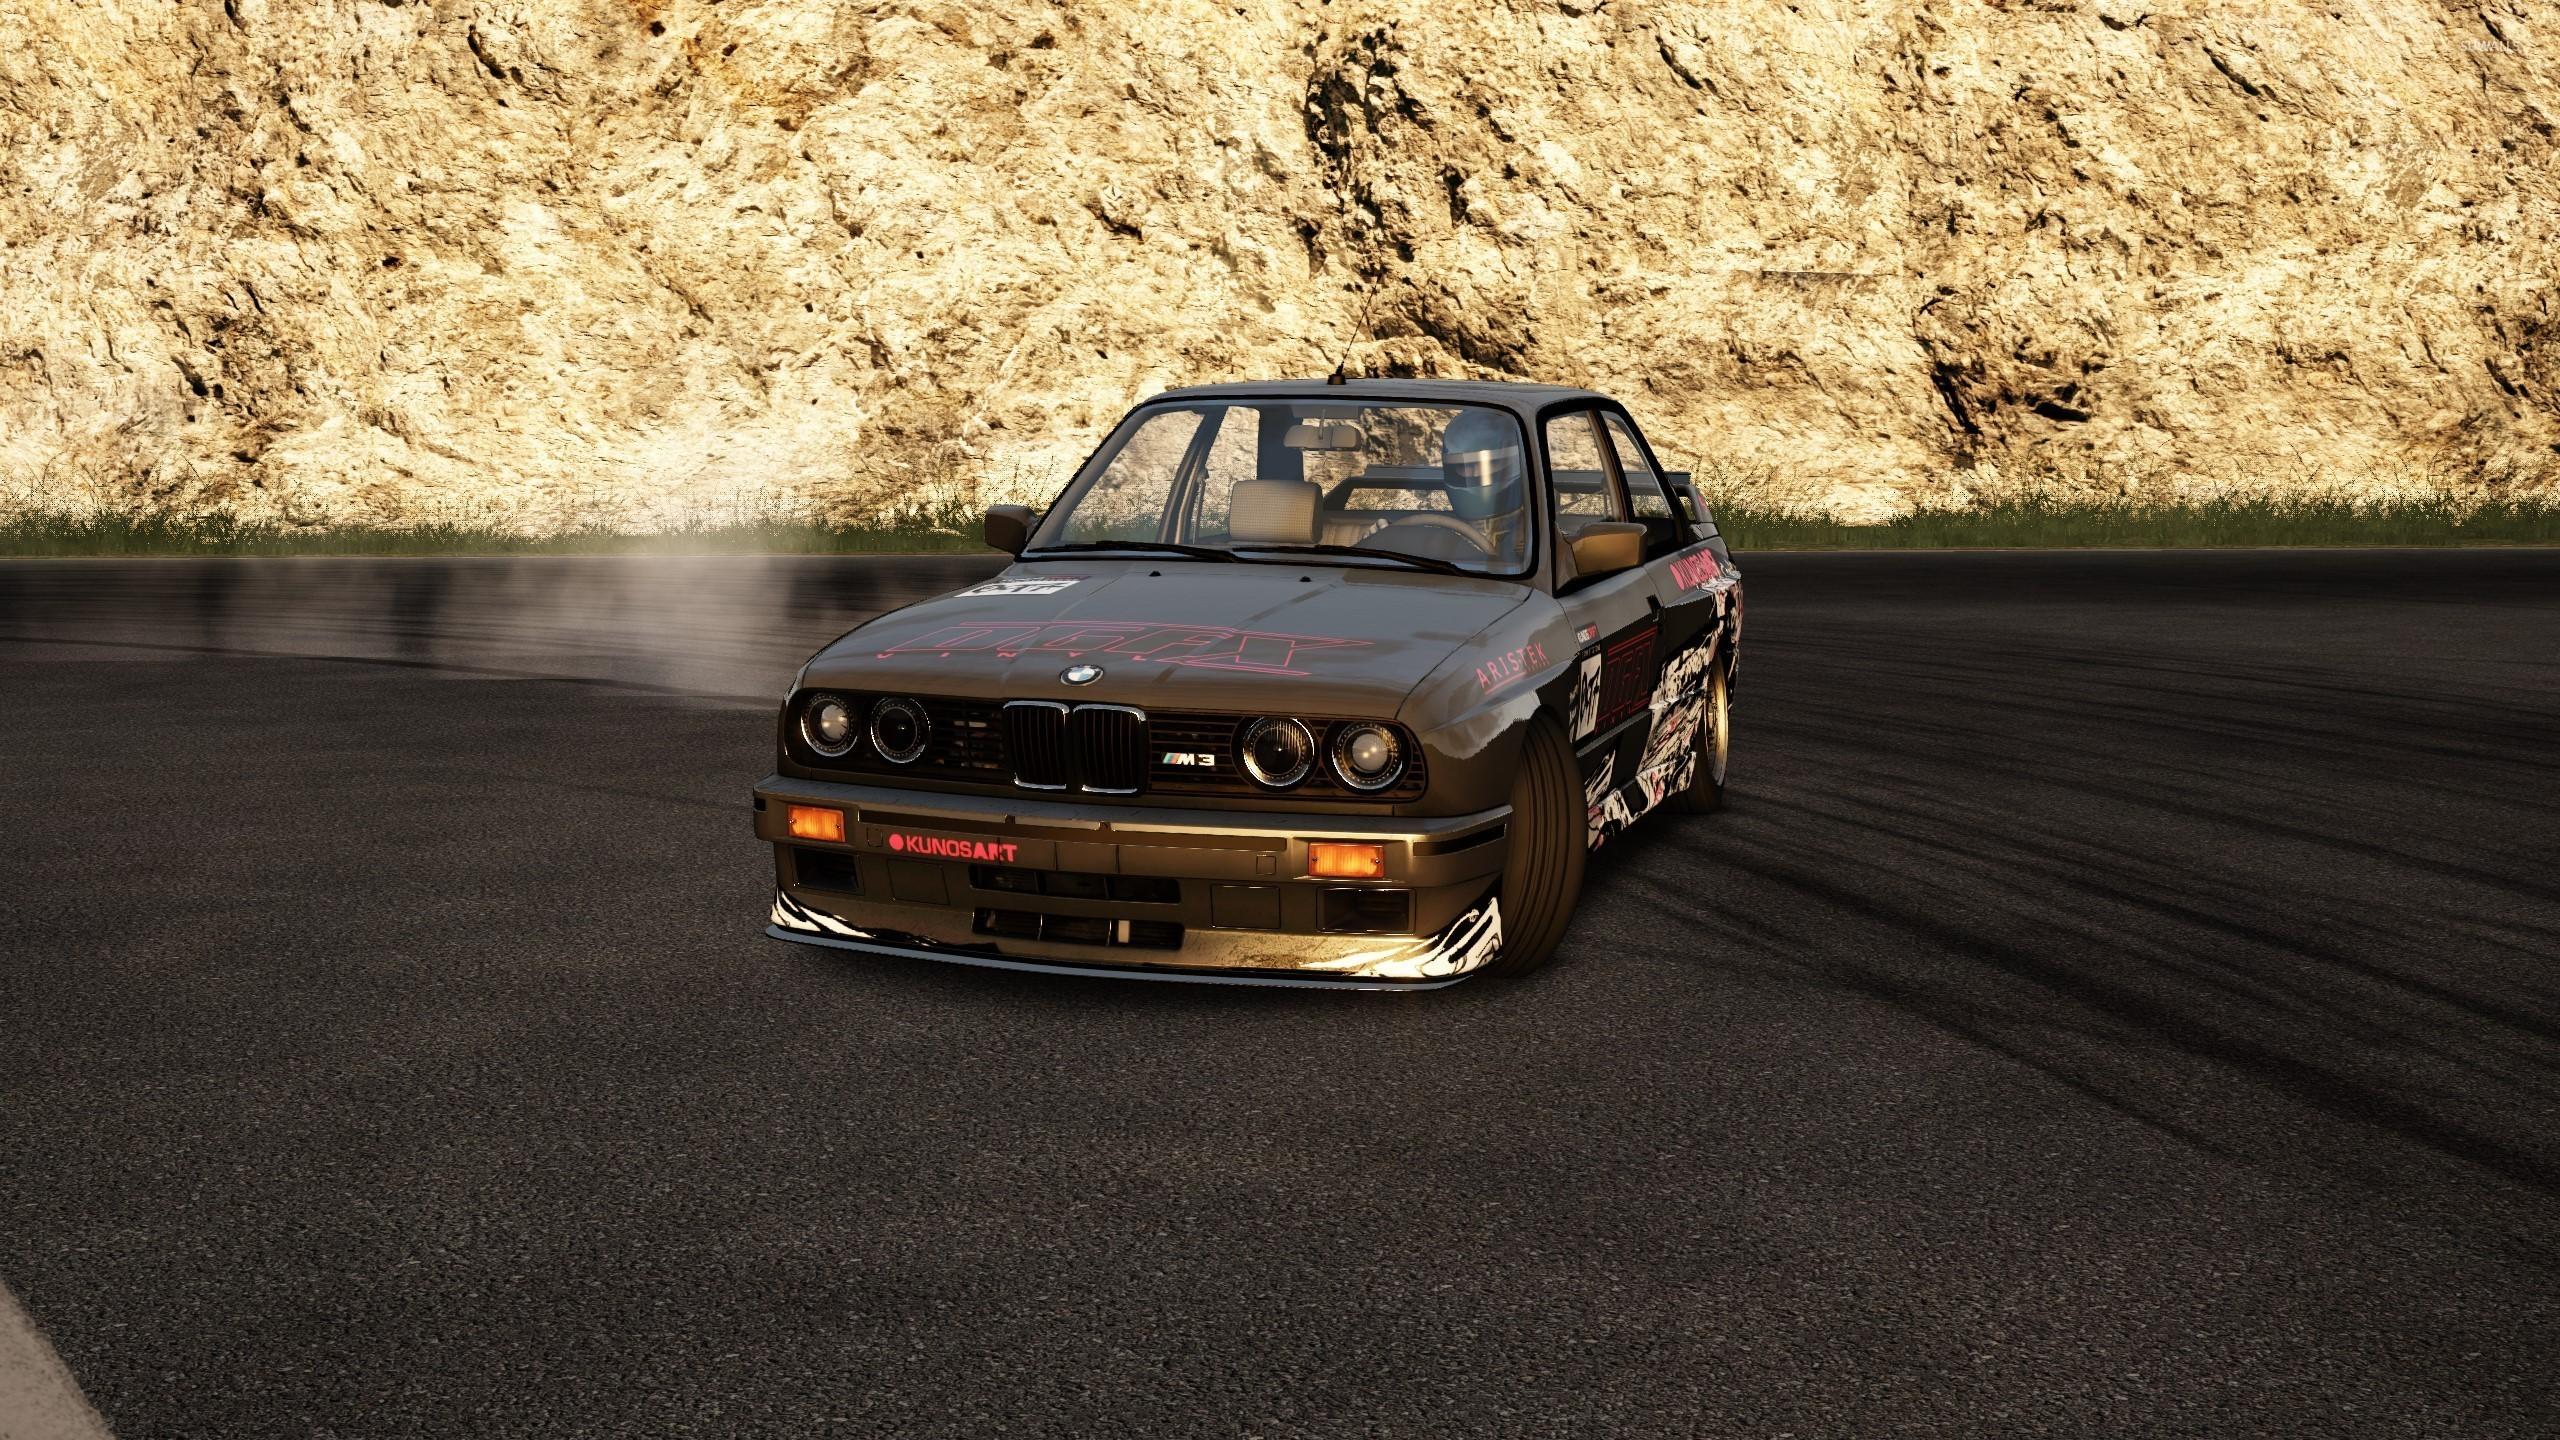 Drift Cars Wallpaper 71 Images